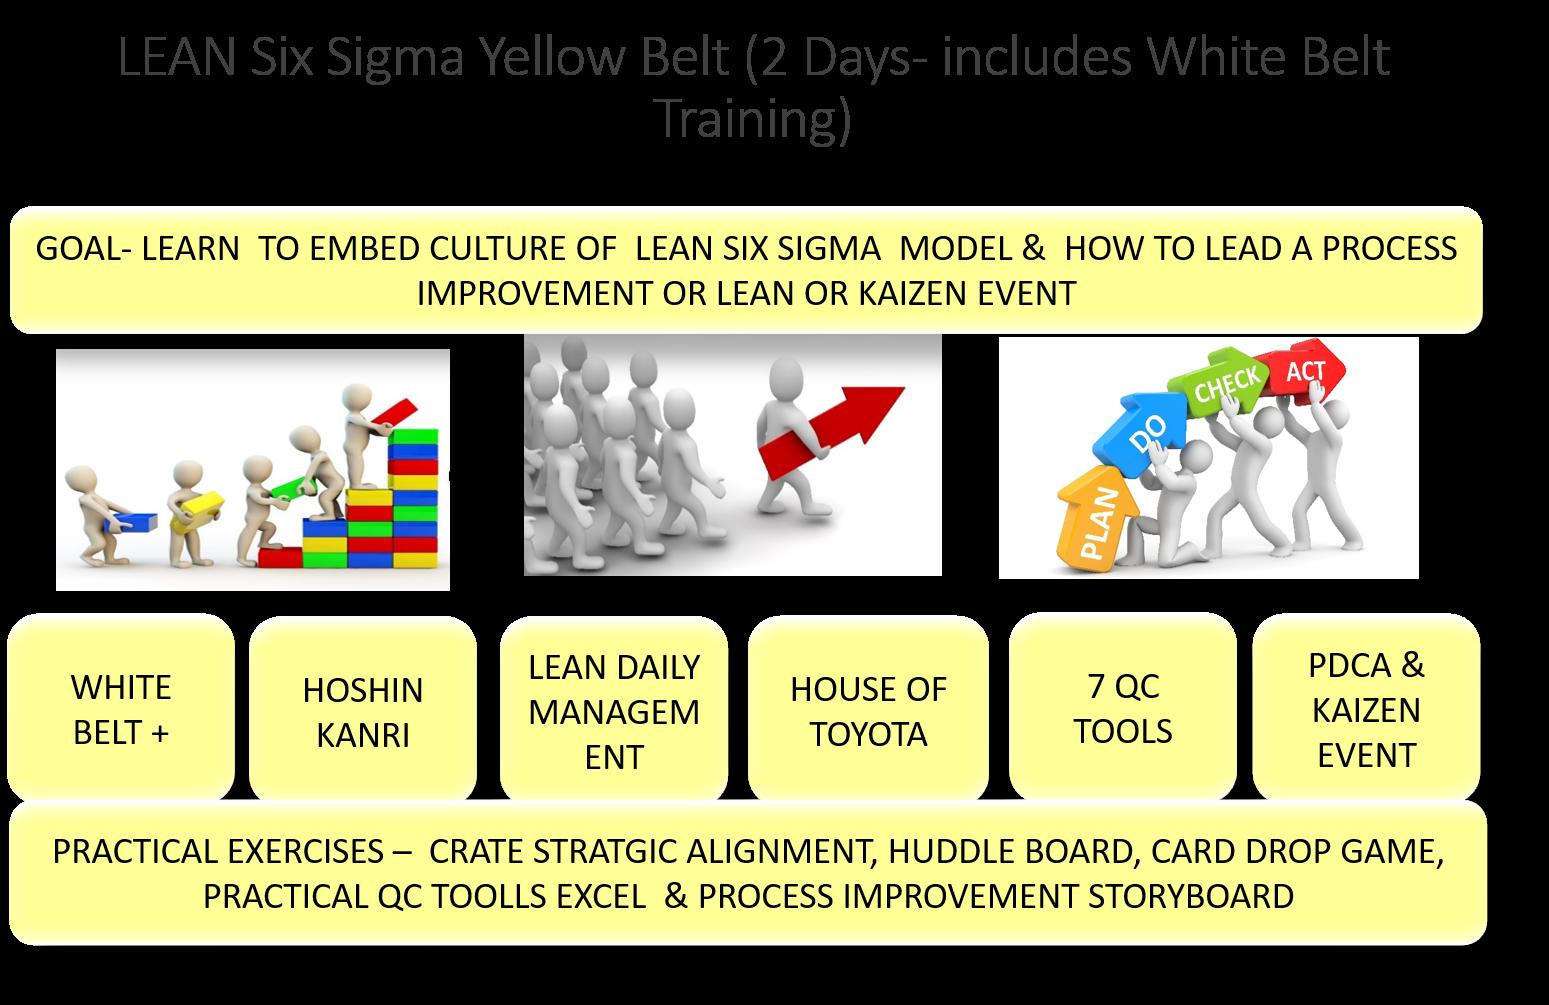 PMI LAKESHORE PRESENTS LEAN SIX SIGMA (LEGO) YELLOW BELT CERTIFICATION, 2 DAYS,JANUARY 25 & FEBRUARY 1 2020